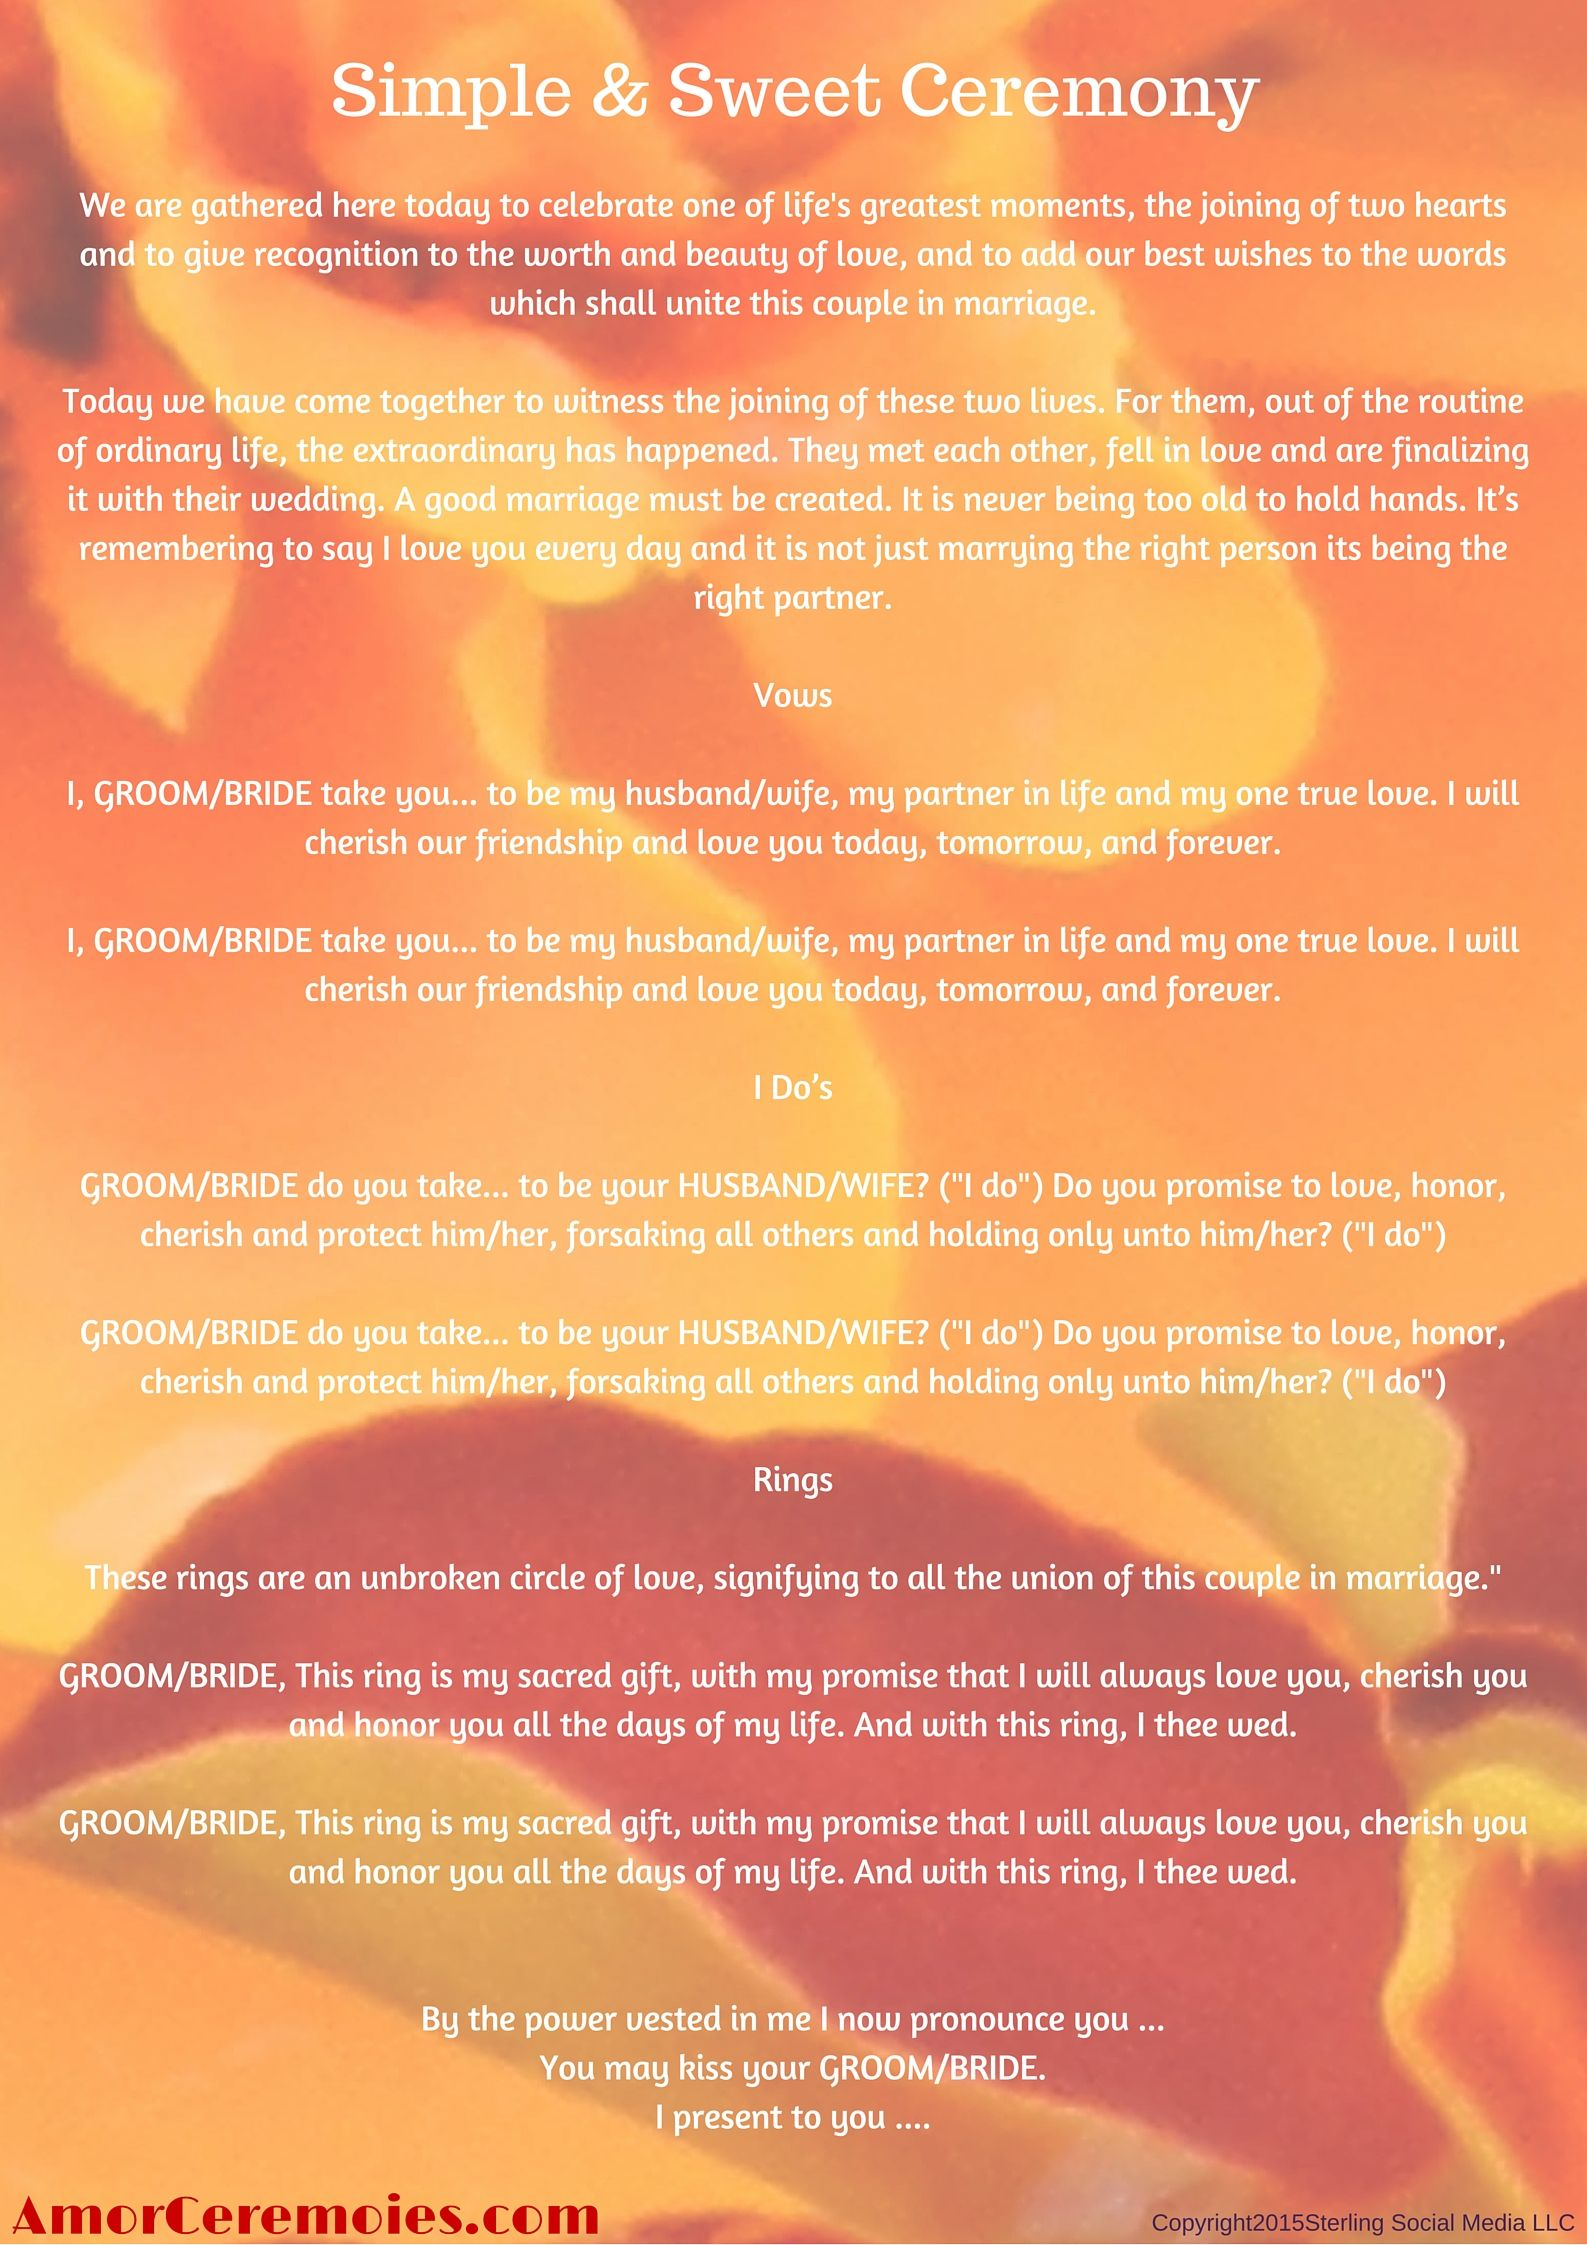 Simple Wedding Ceremony Script